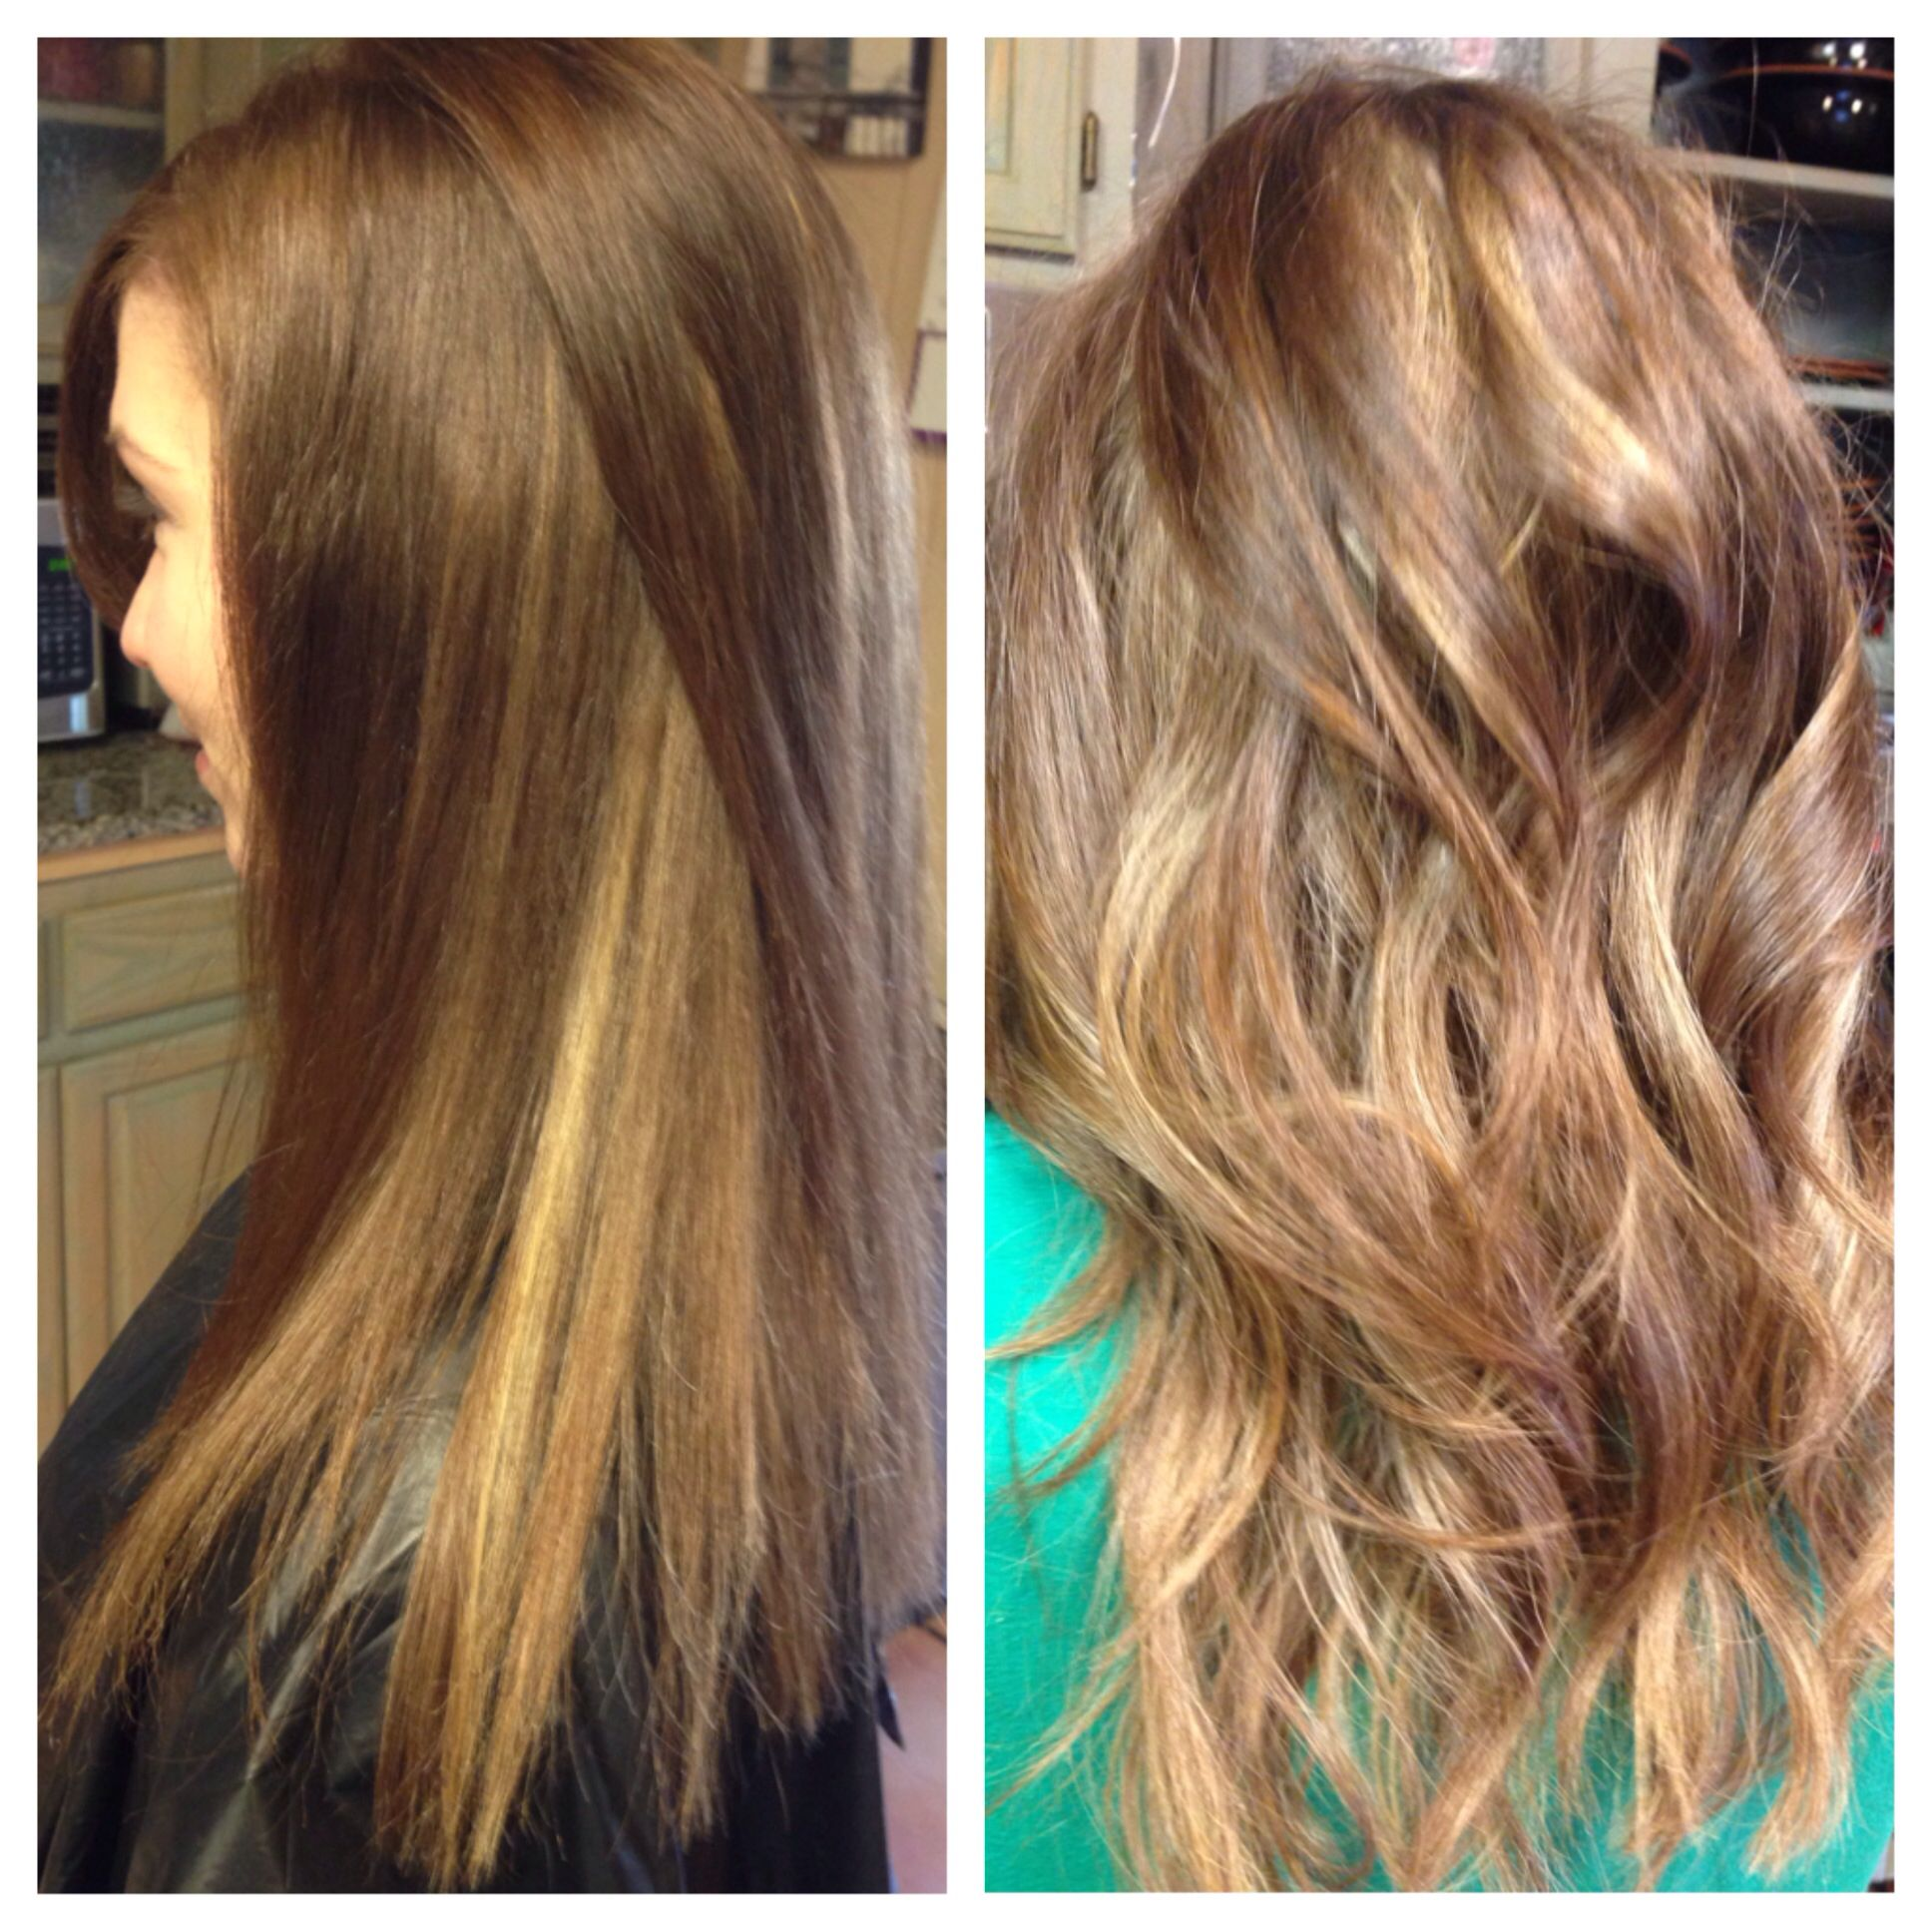 Pin By Terryn Kathleen On Clients Light Brown Hair Blonde Hair Makeup Hair Highlights